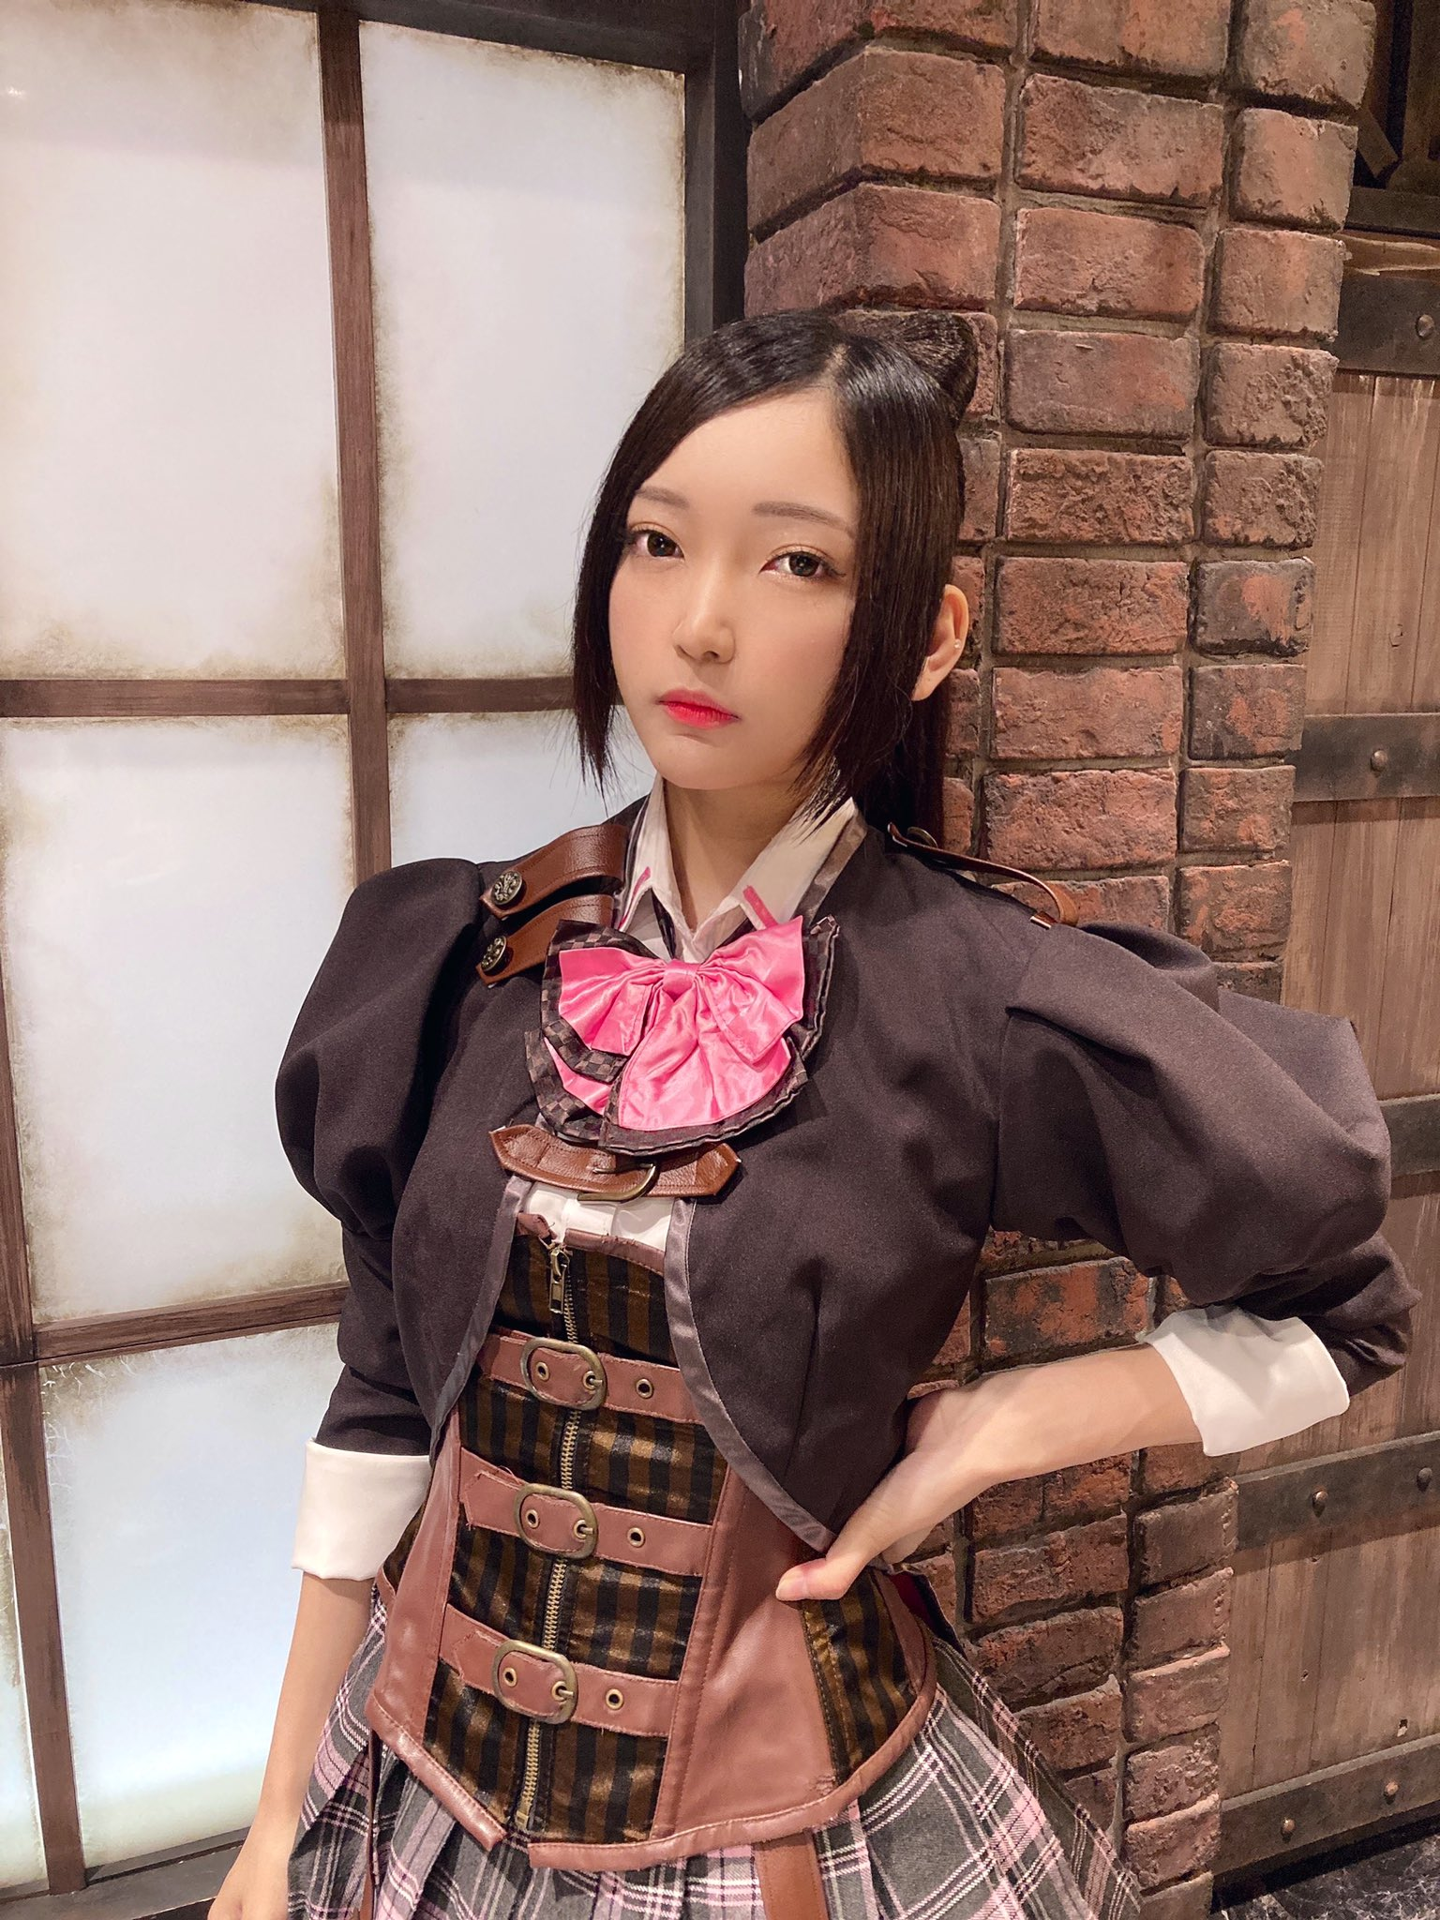 File:NishimotoRimi.jpg